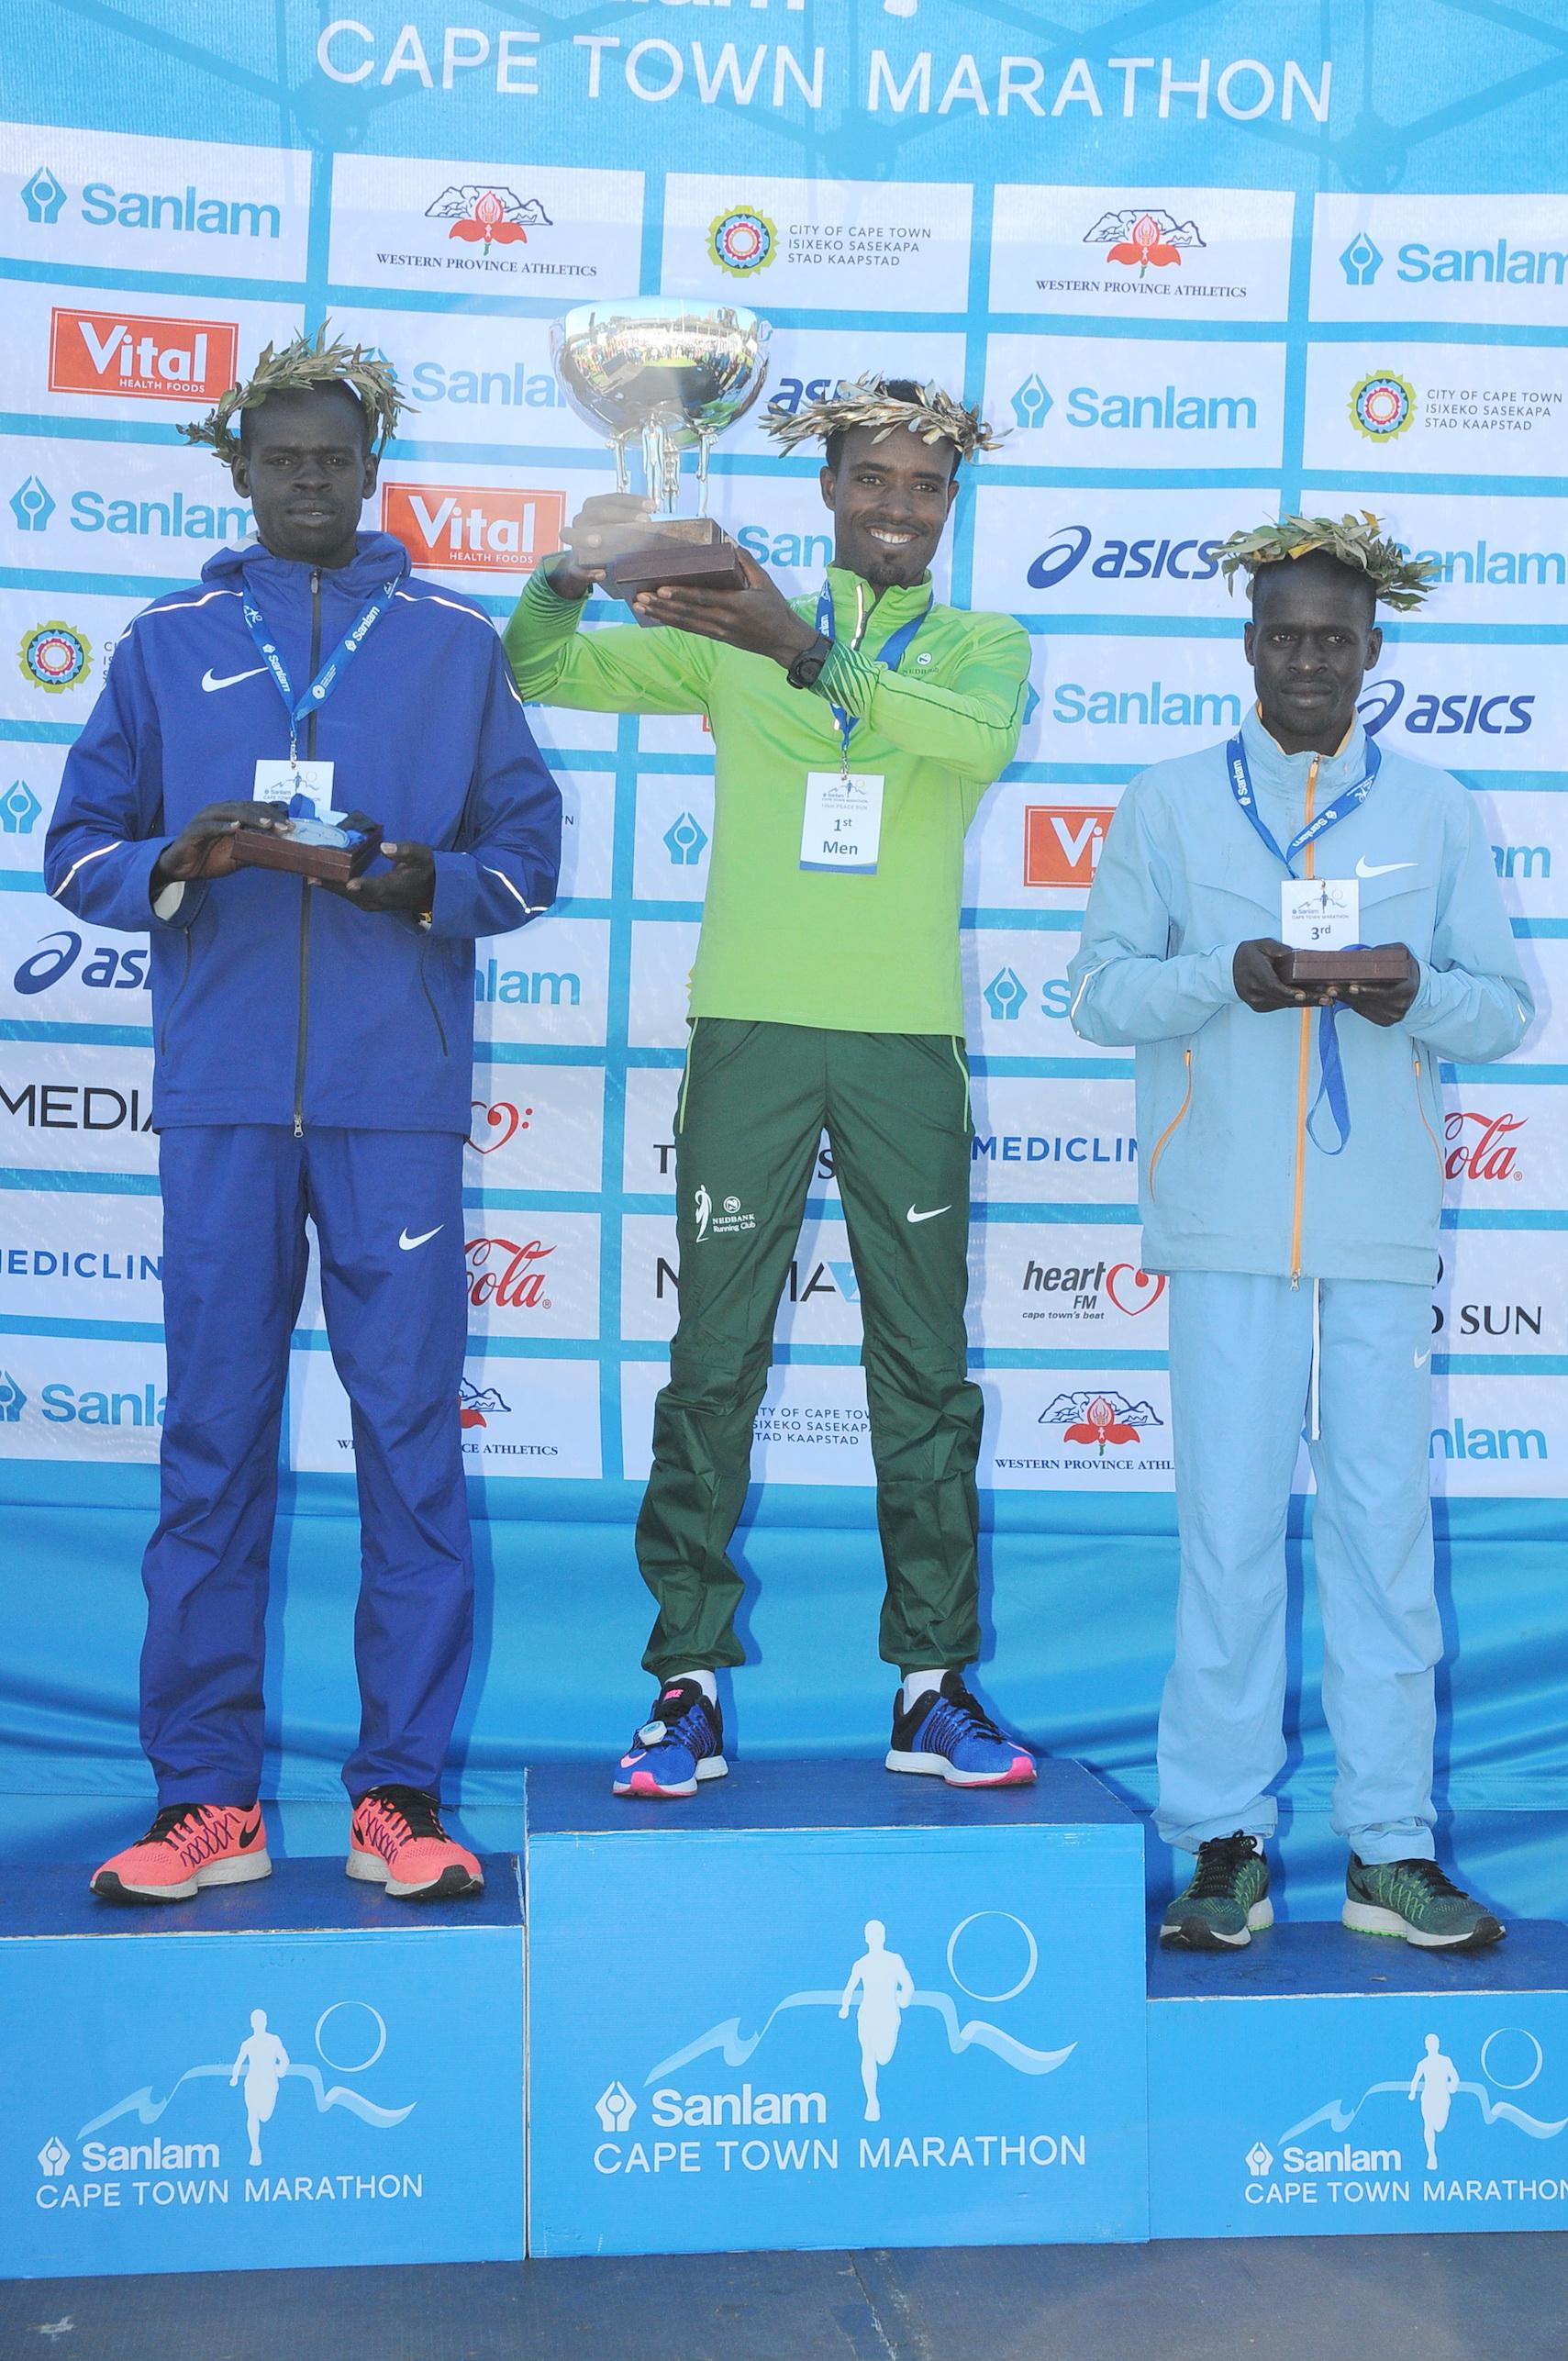 TOP3 – Top 3 Men of Sanlam Cape Town Marathon 2016 42.2km event